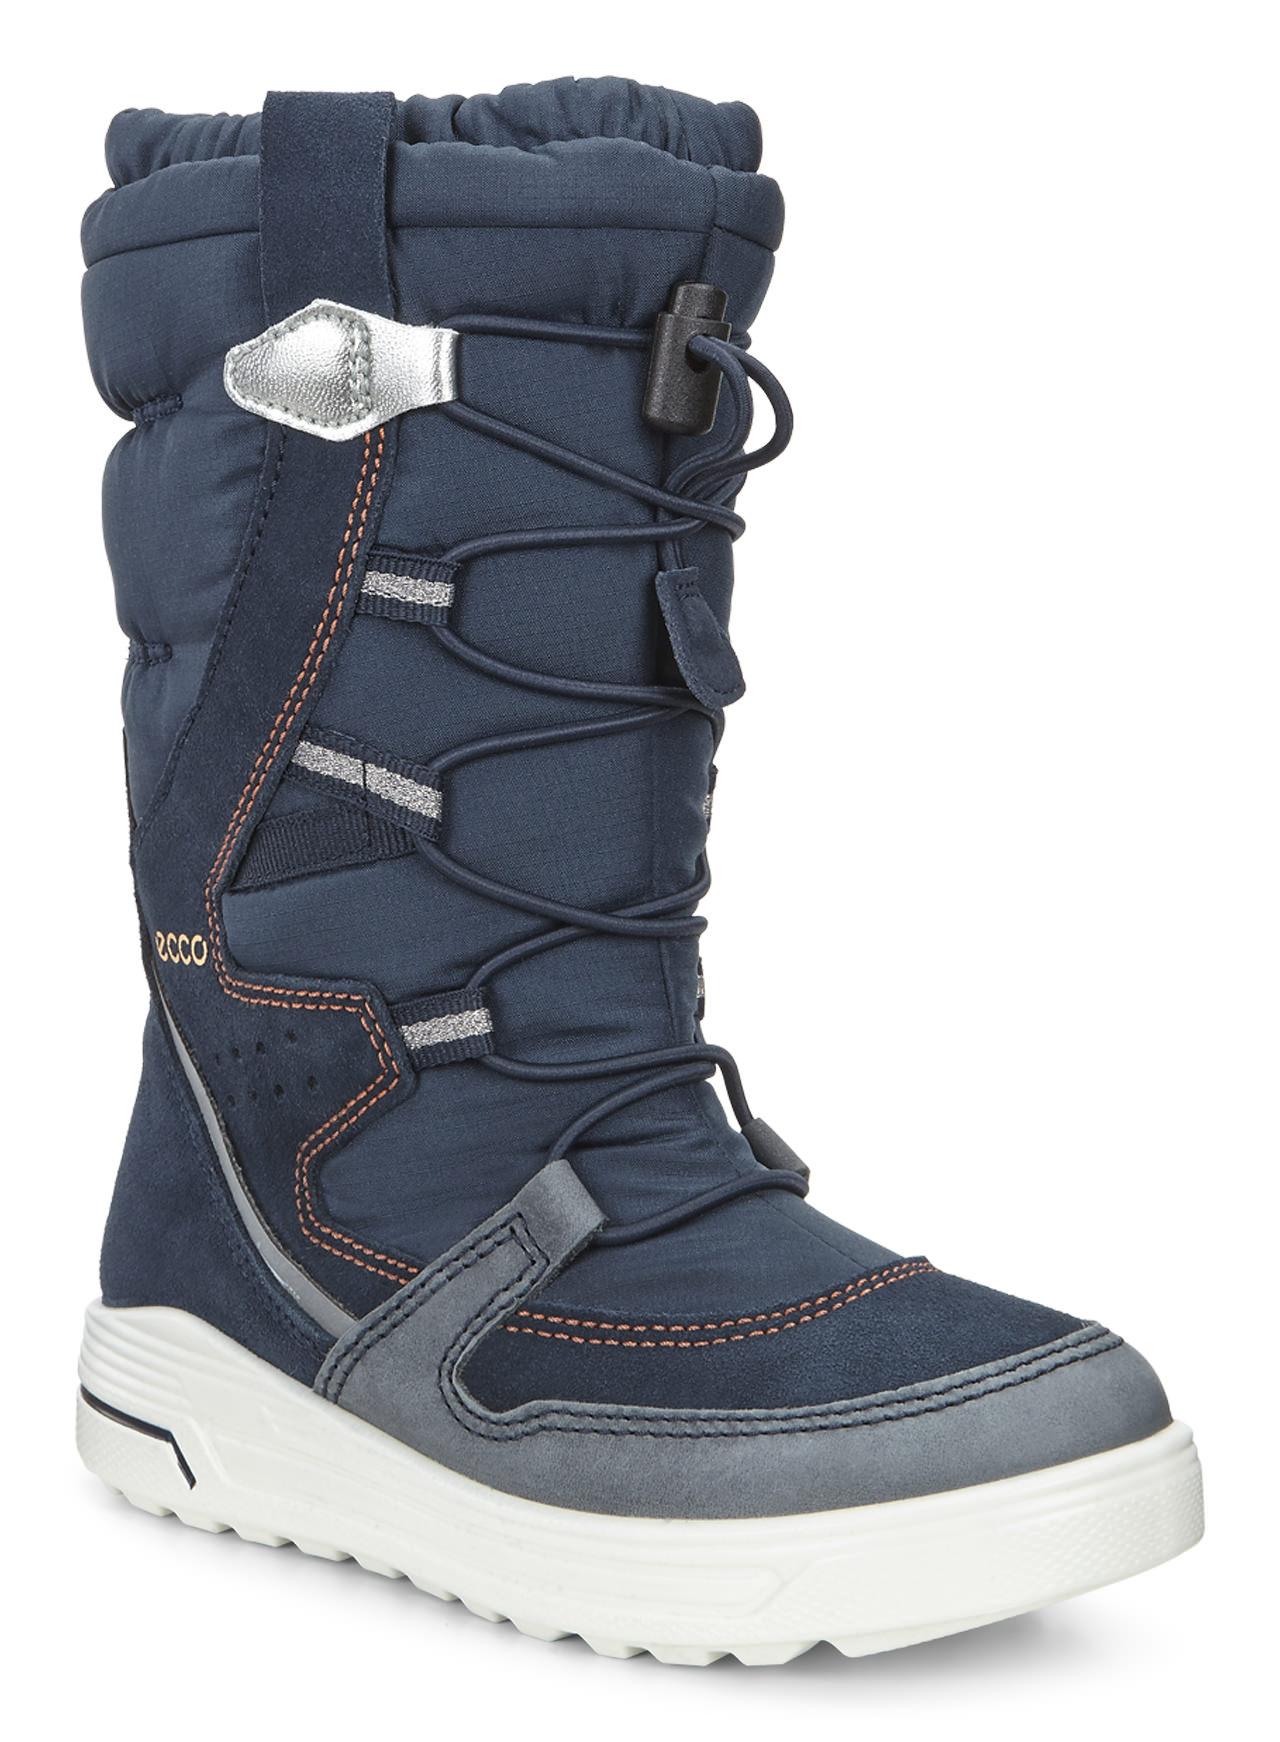 44f2718bb49d ECCO URBAN SNOWBOARDER Girls Boots